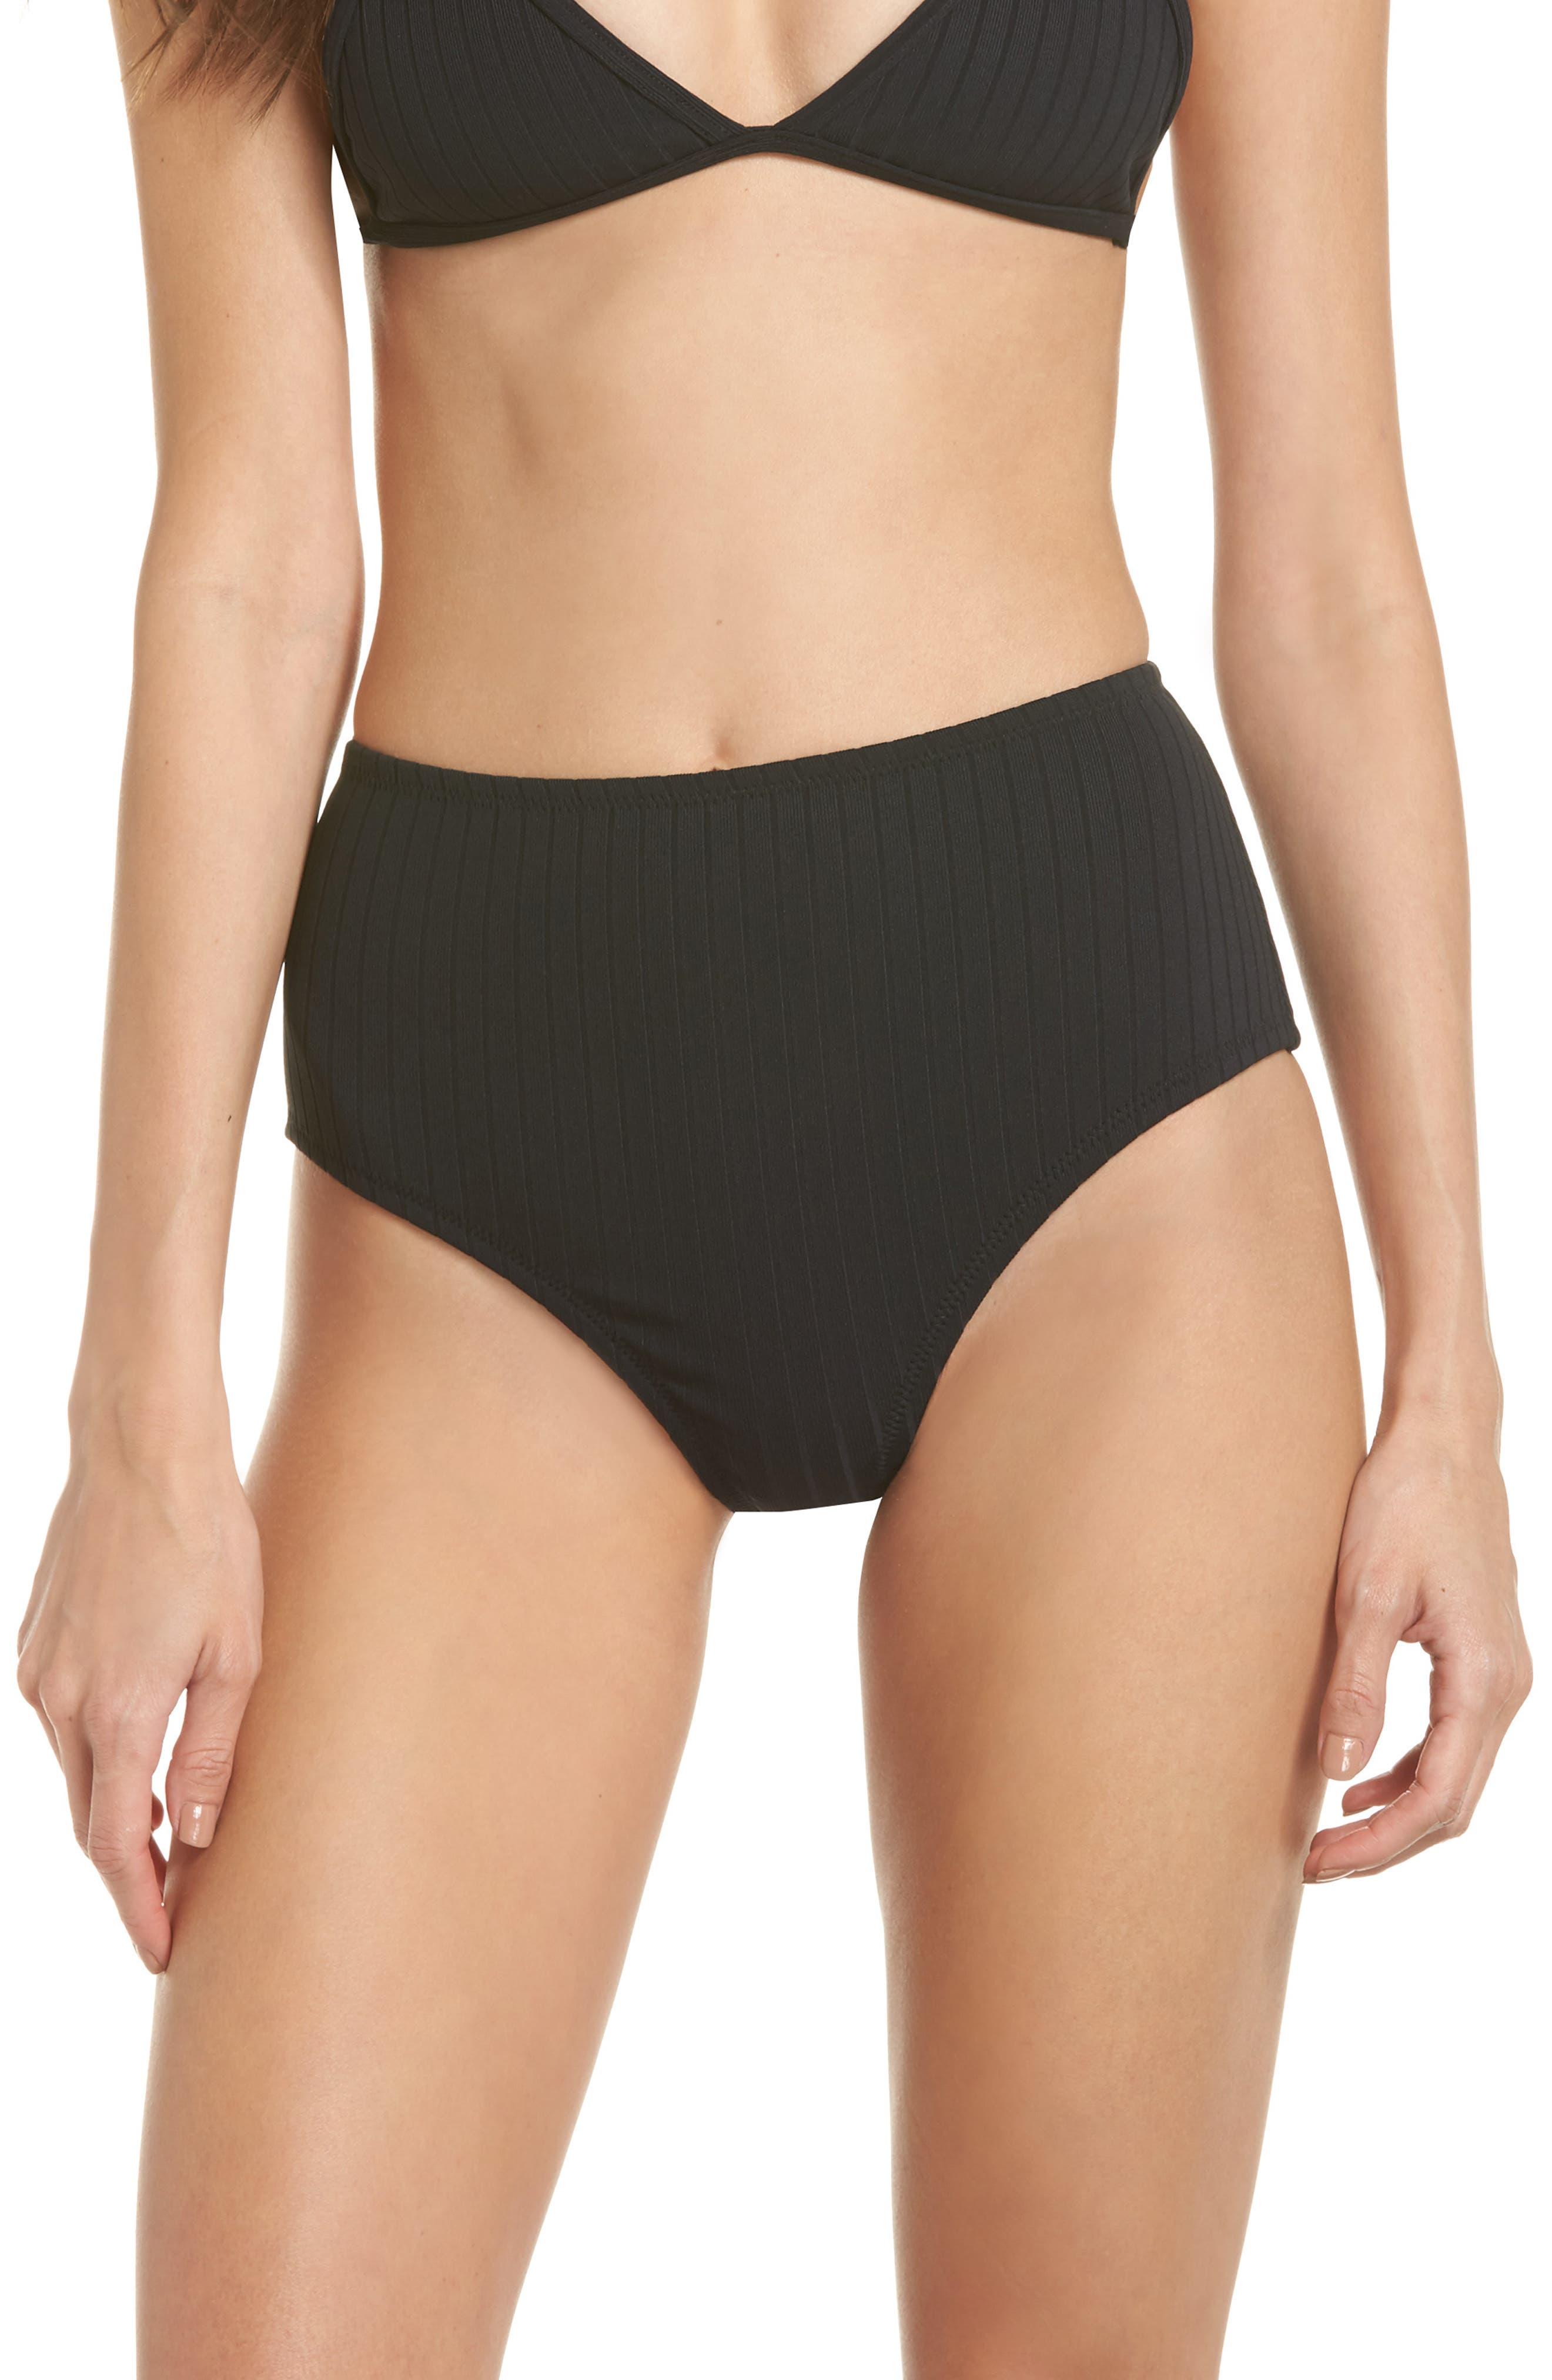 Westwood High Waist Bikini Bottoms,                         Main,                         color, 001